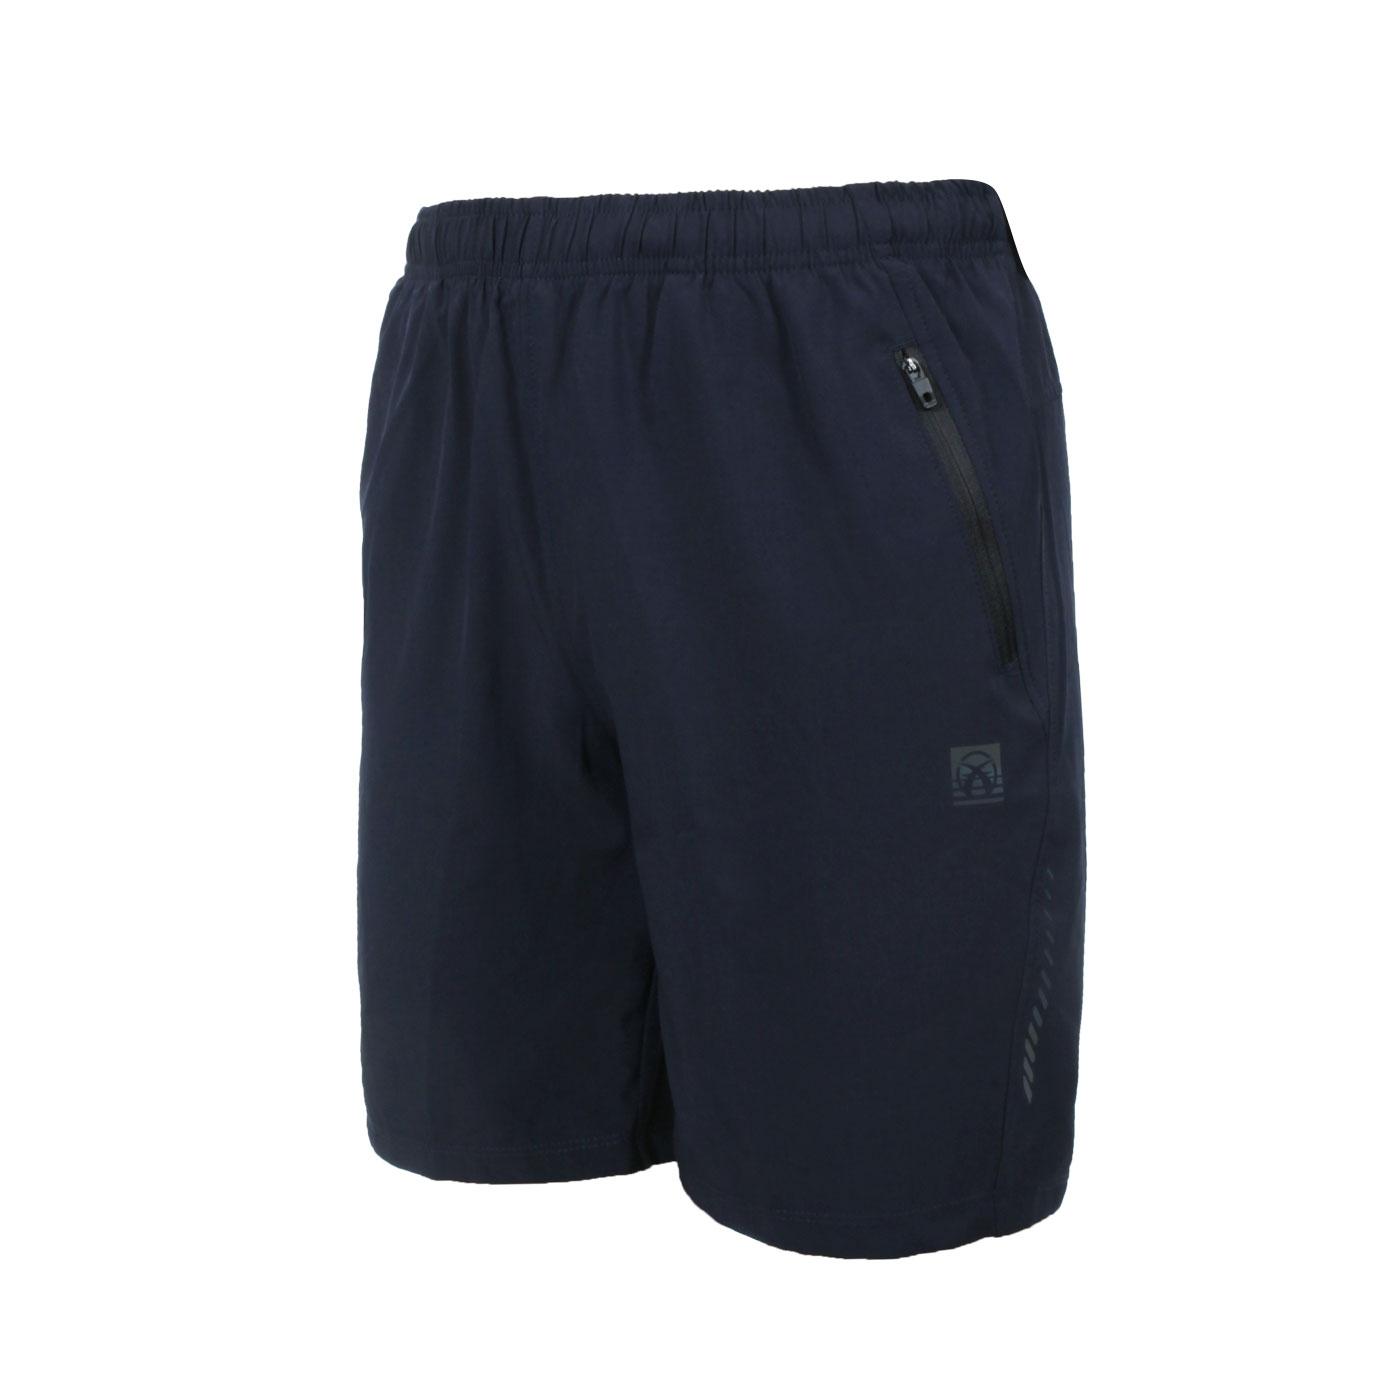 FIRESTAR 女款彈性平織短褲 CL125-93